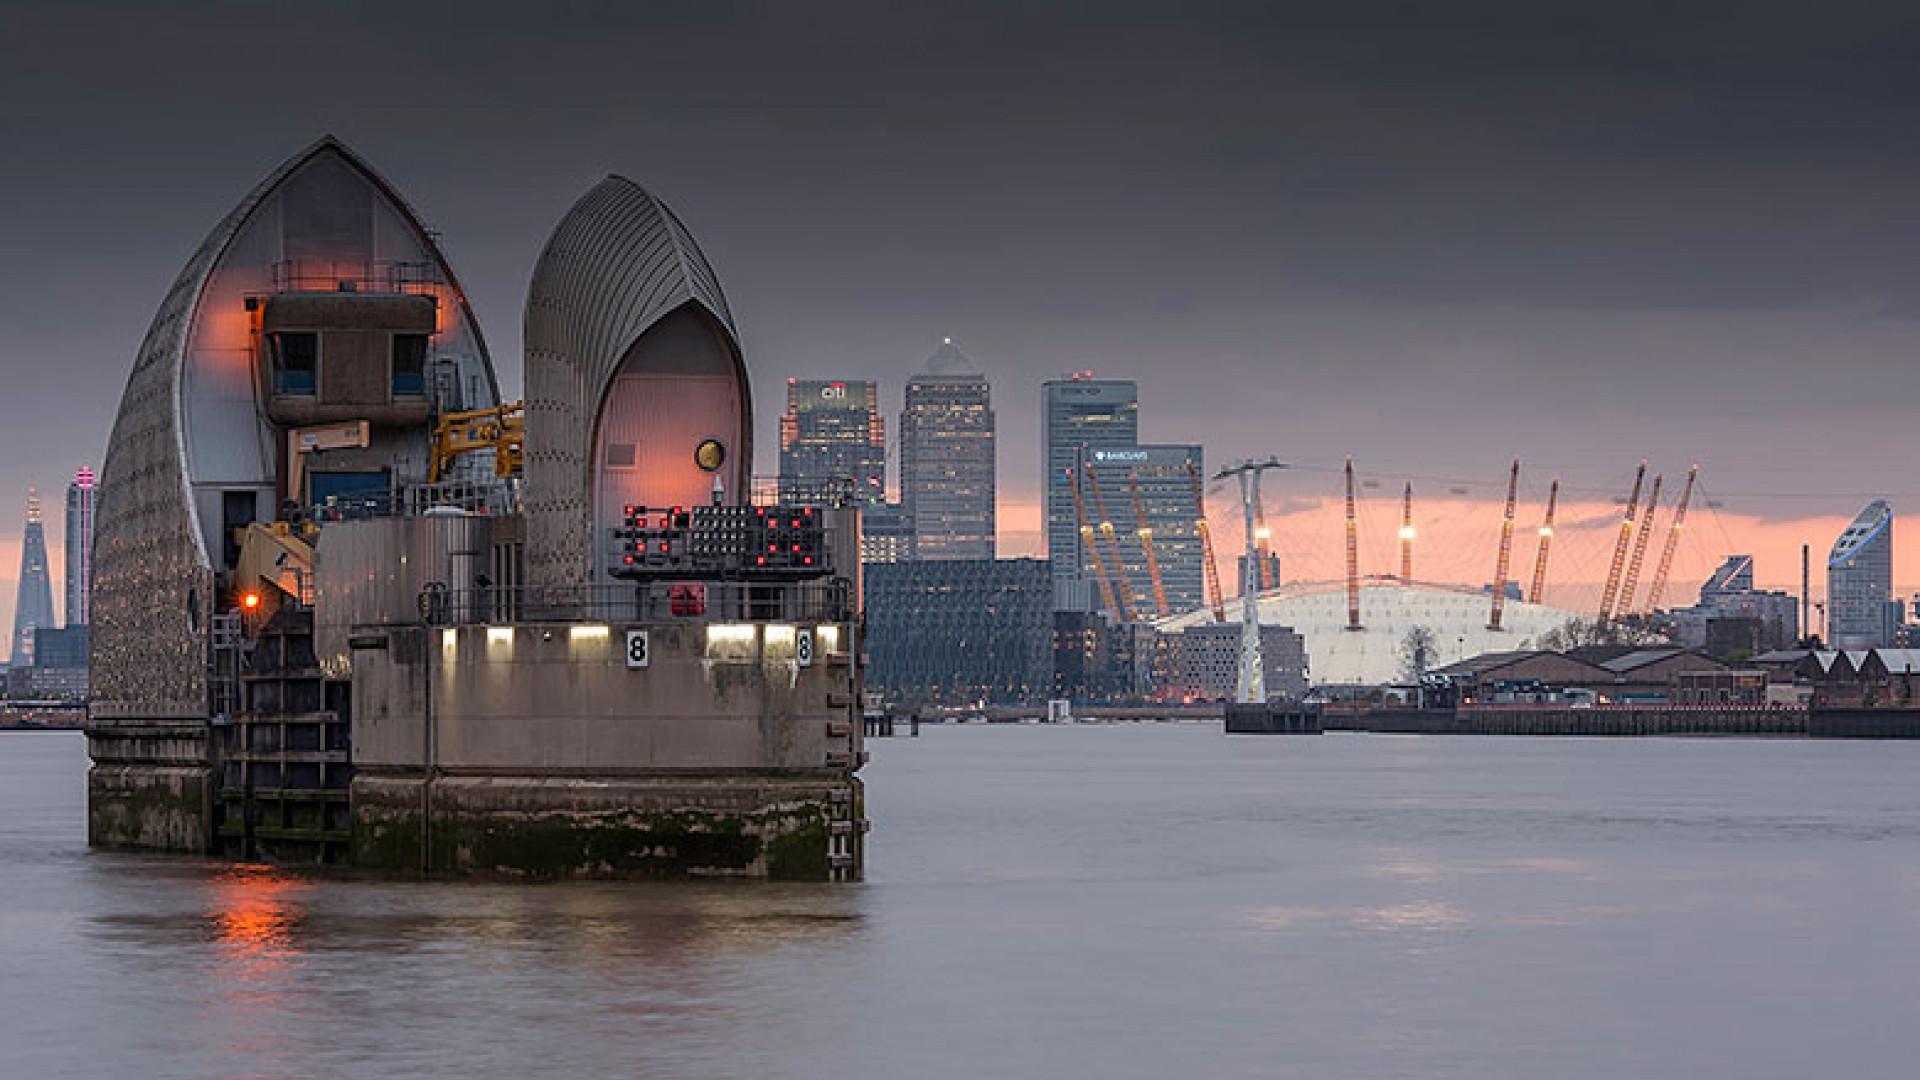 City-Twilight,-London-by-Charlotte-Gilliatt,-(Take-a-view,-2013)